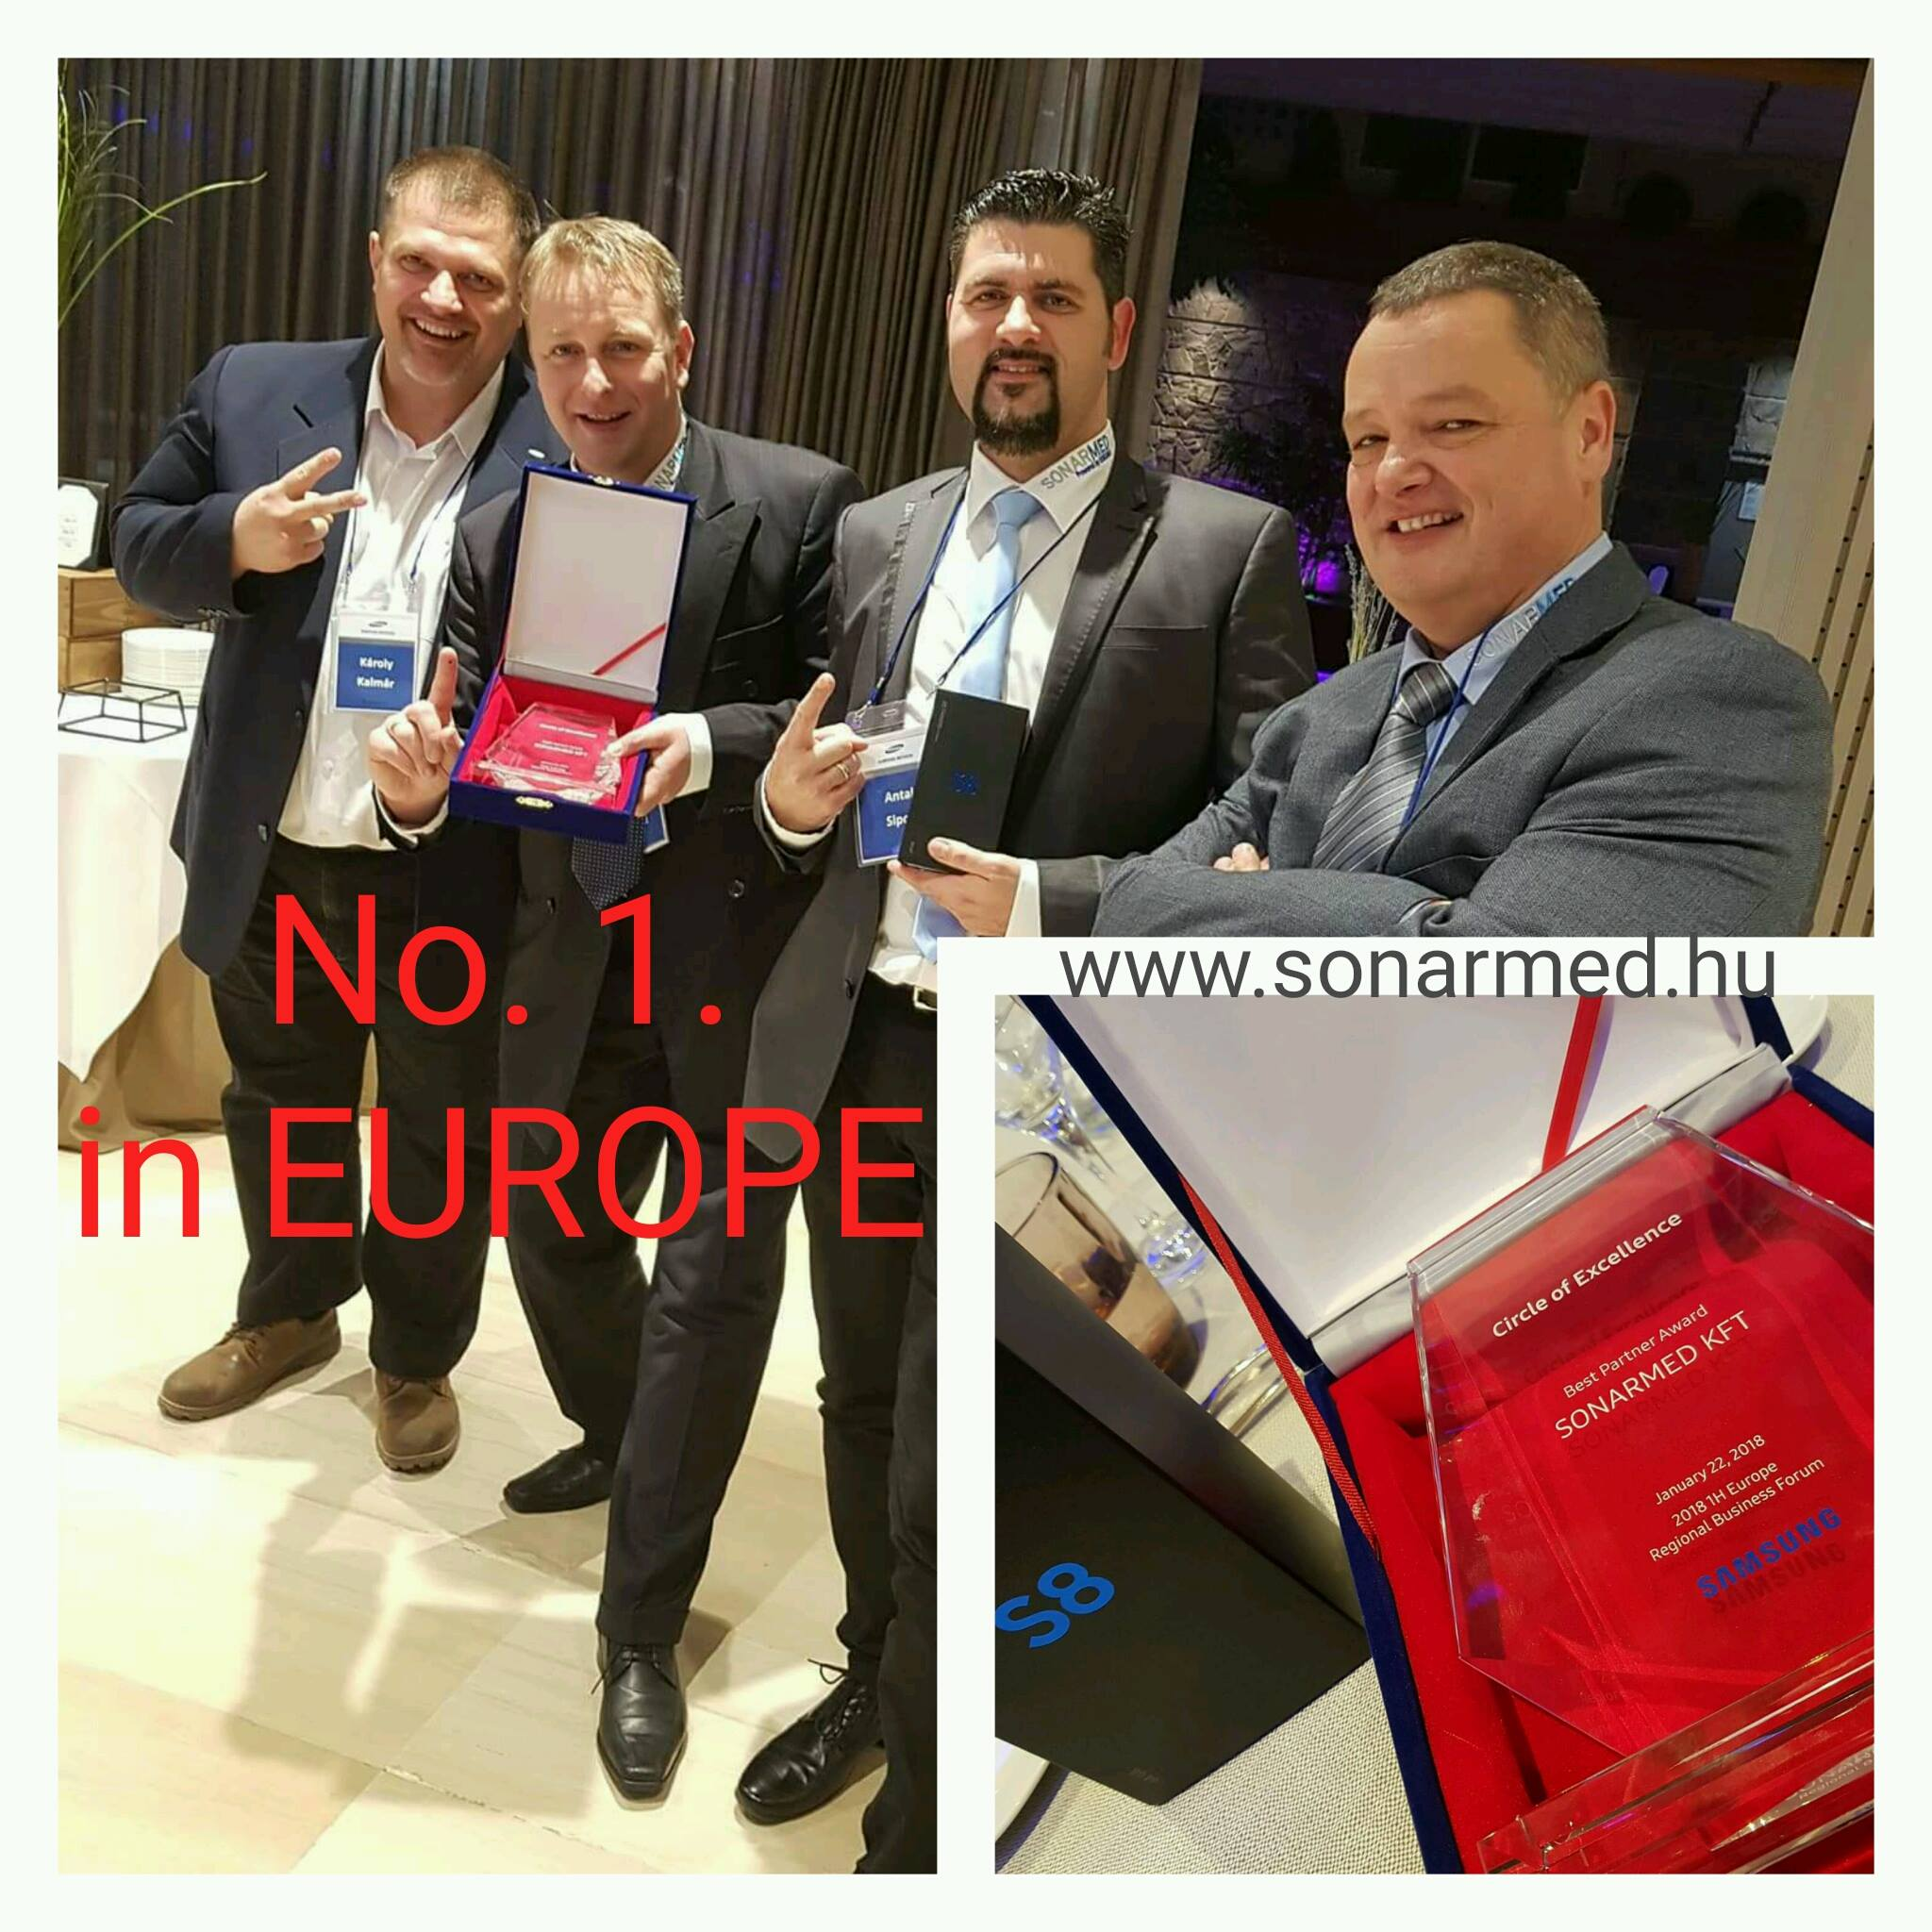 2018 Samsung Regional Business Forum Barcelona - Best Partner - SONARMED